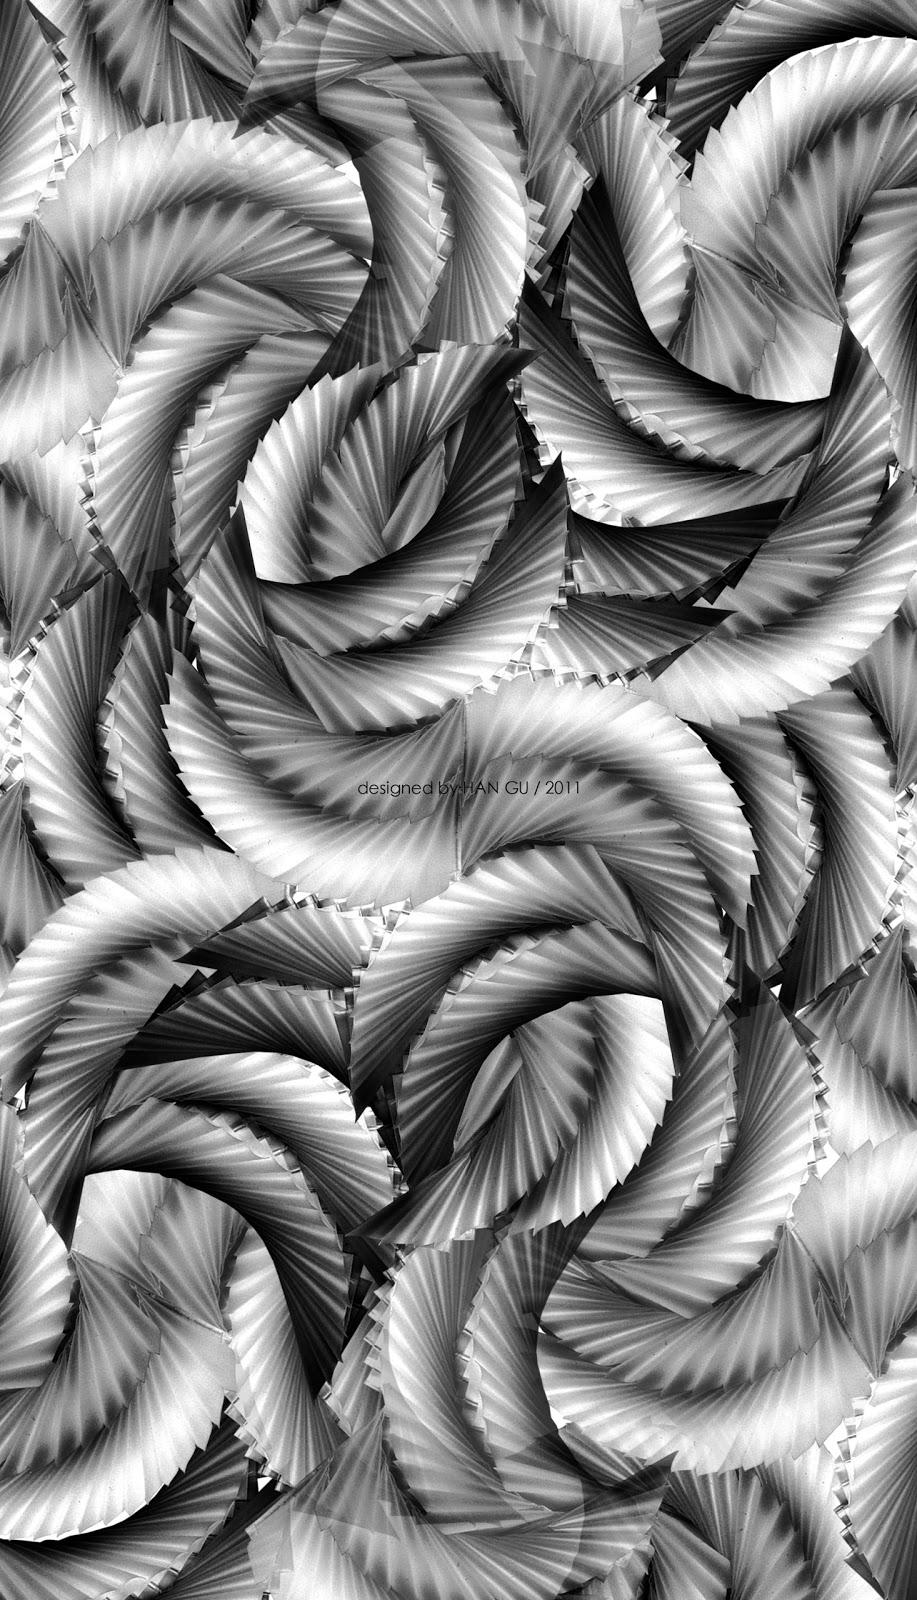 HAN GU . UNI: Digital Print Pattern Design